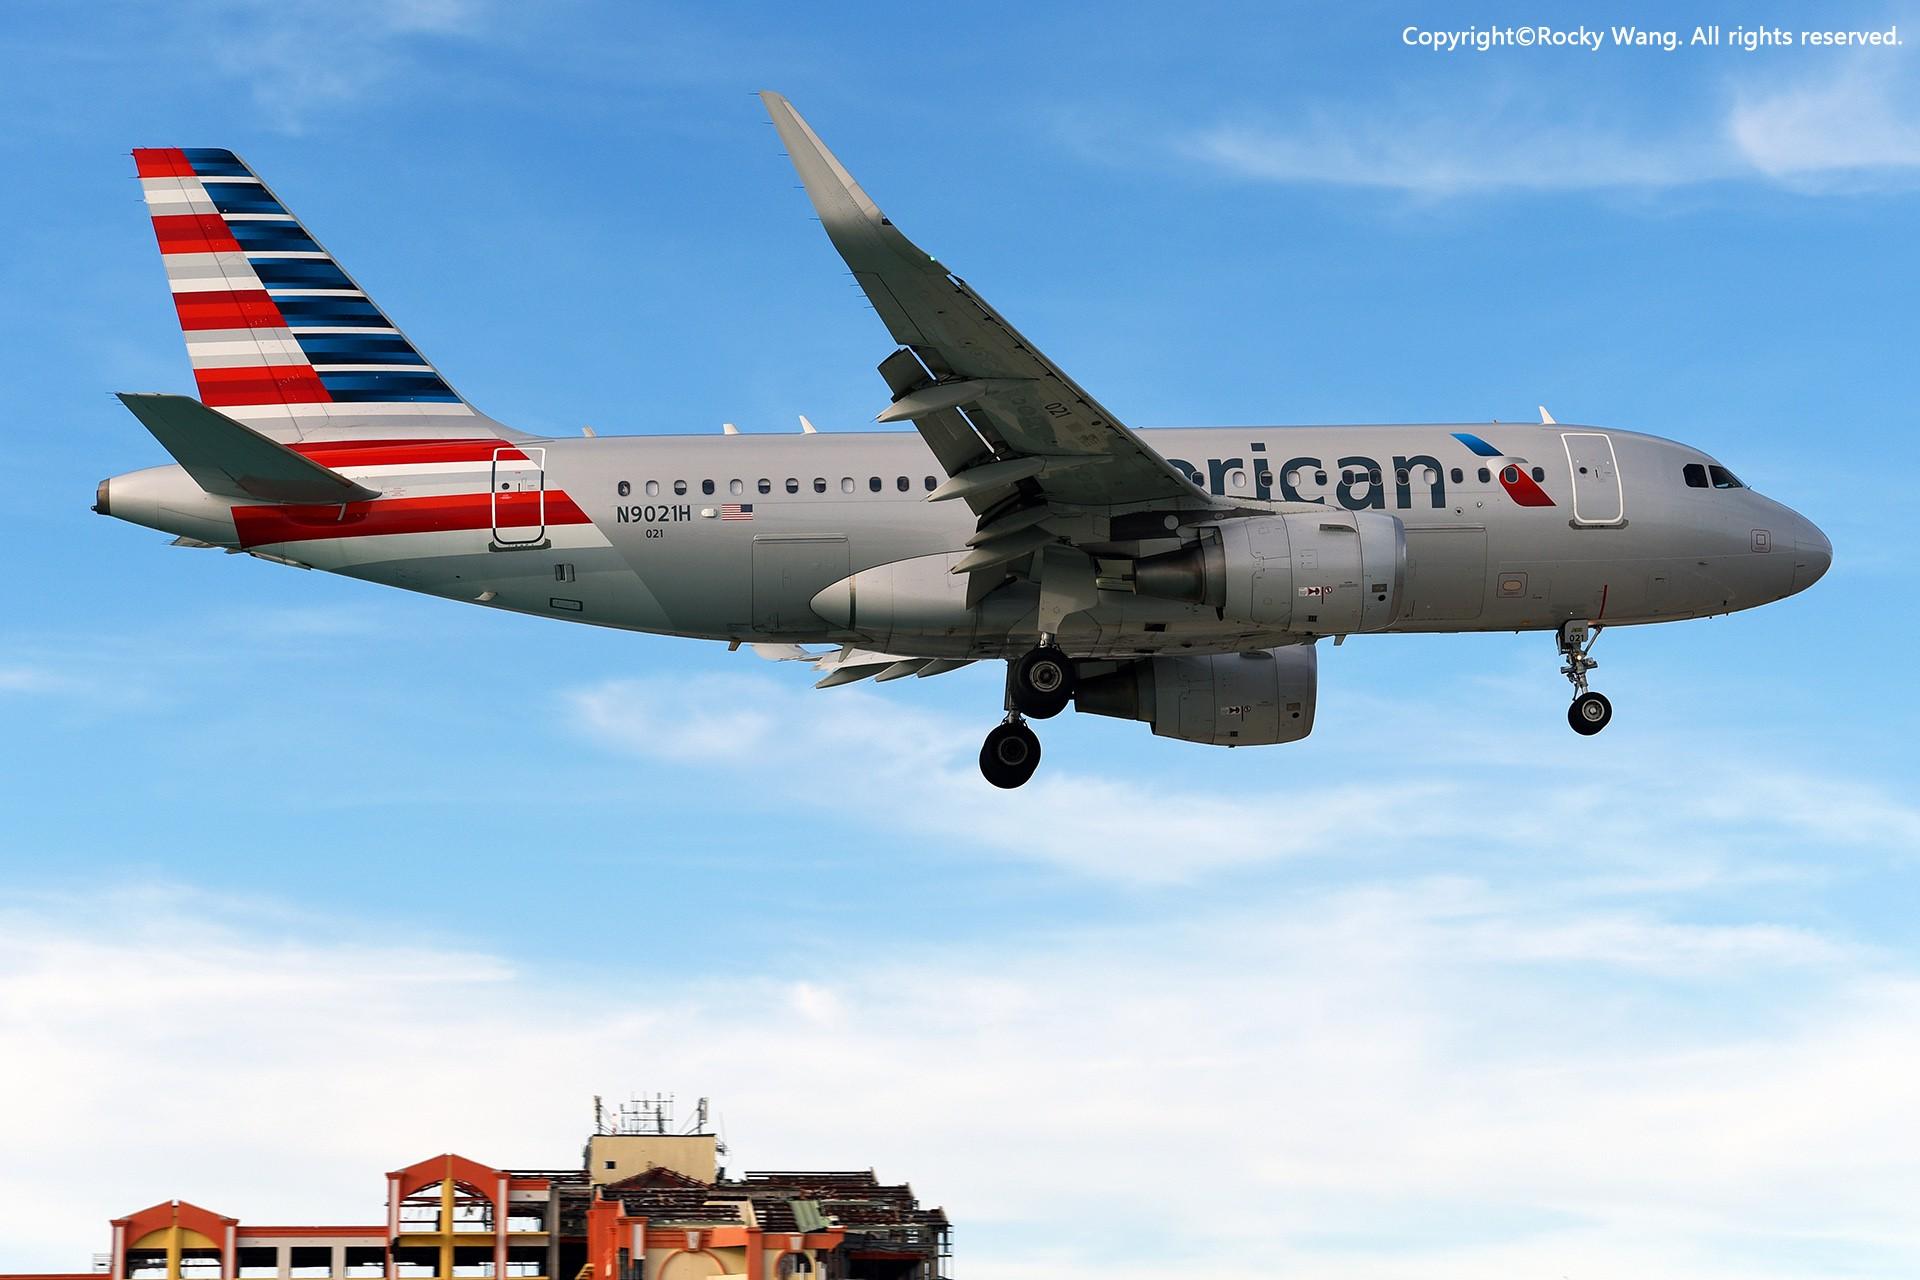 Re:[原创]My endless Caribbean dream——圣马丁朱莉安娜公主机场拍机记 AIRBUS A319-115 N9021H 荷属安的列斯群岛朱利安娜公主机场